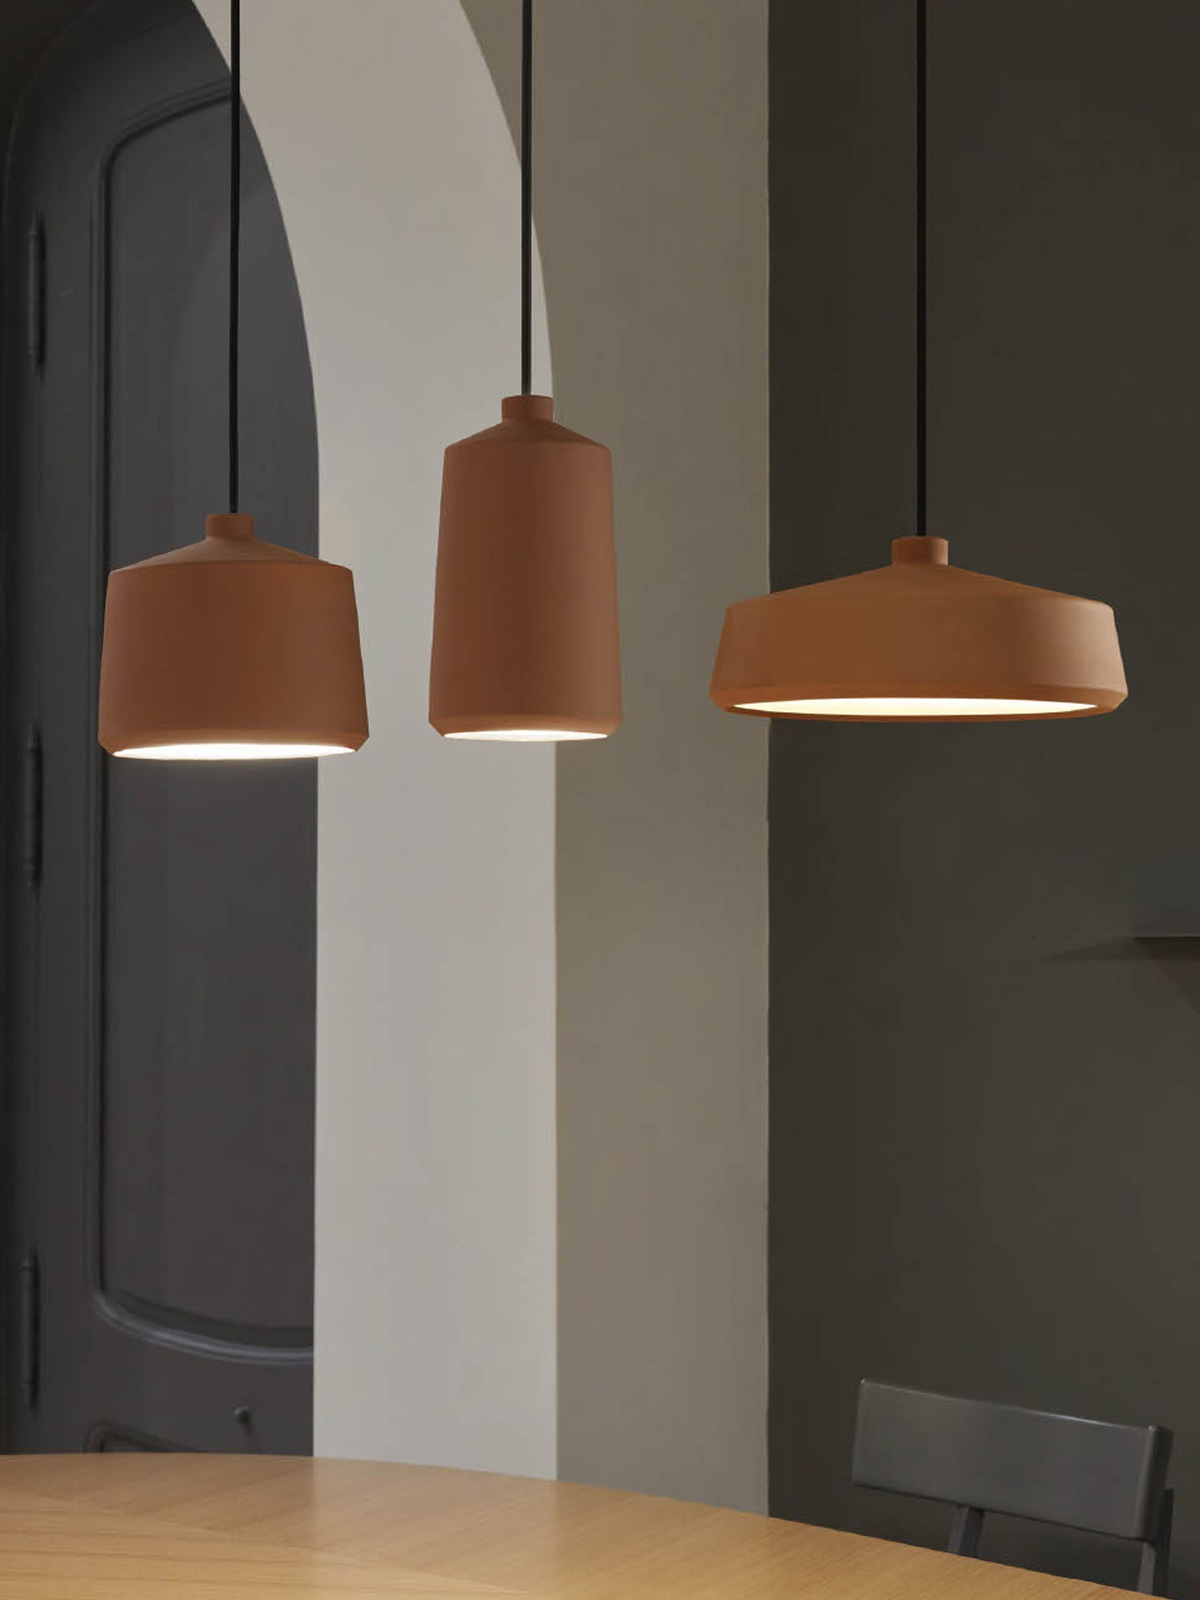 Flame Leuchtenserie Keramik Lampen Pott DesignOrt Berlin